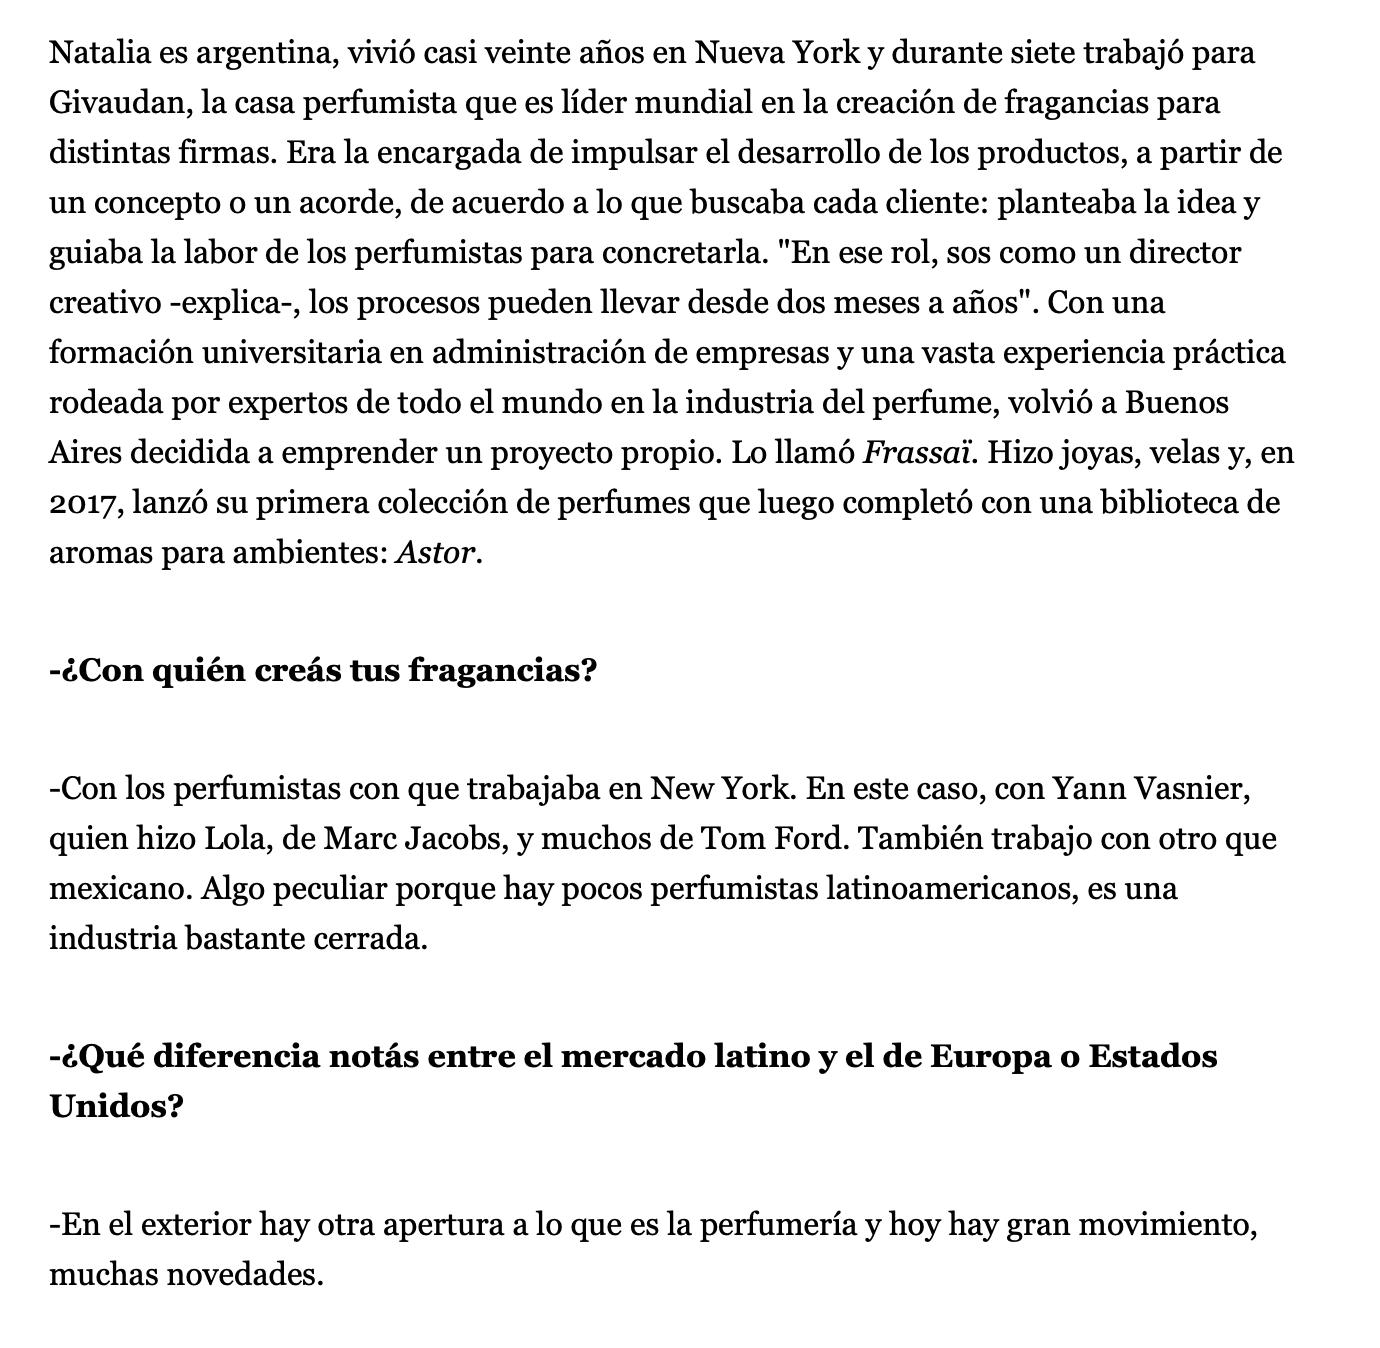 Natalia Outeda Perfumes FRASSAI La Nacion Moda & Belleza Agosto 11, 2019